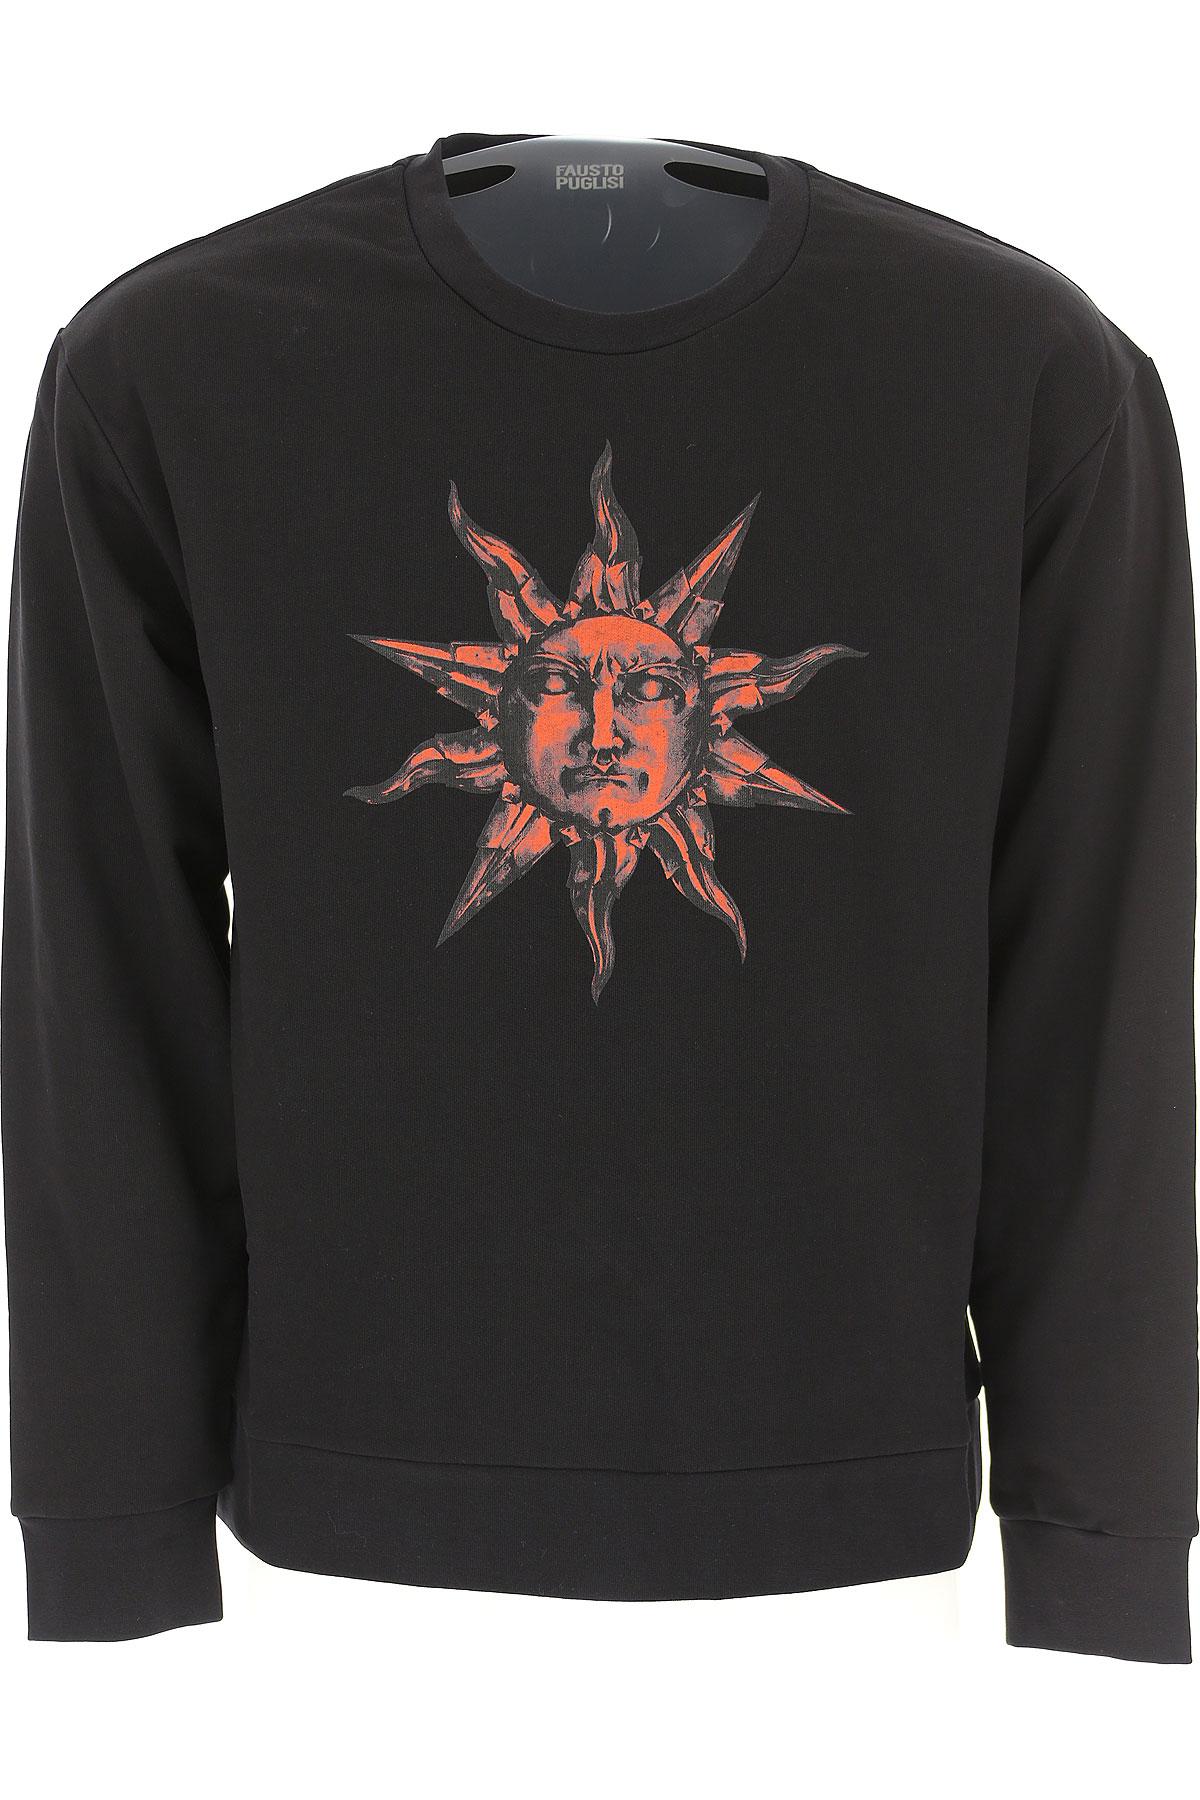 Image of Fausto Puglisi Sweatshirt for Men, Black, Cotton, 2017, L M S XL